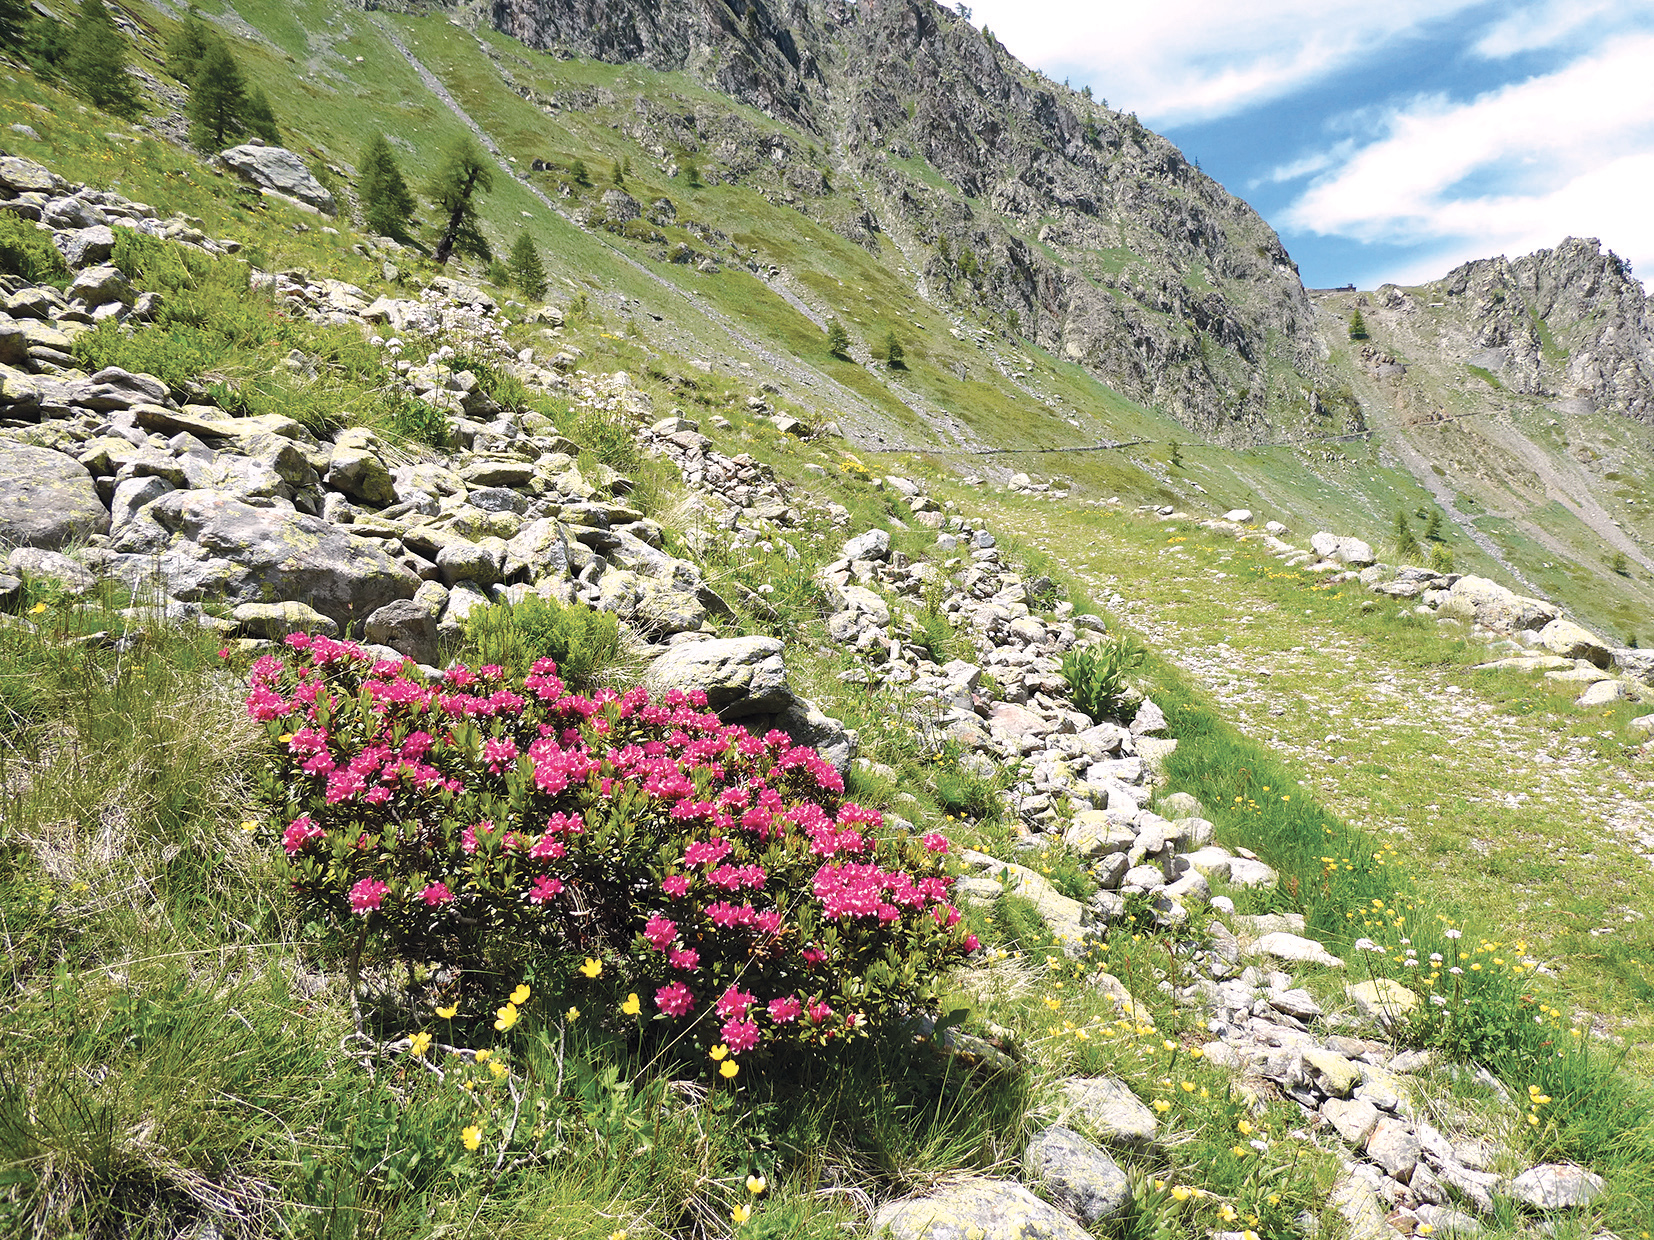 Passo sottano Scolettas - Valle Stura - Paolo Laguzzi 2020